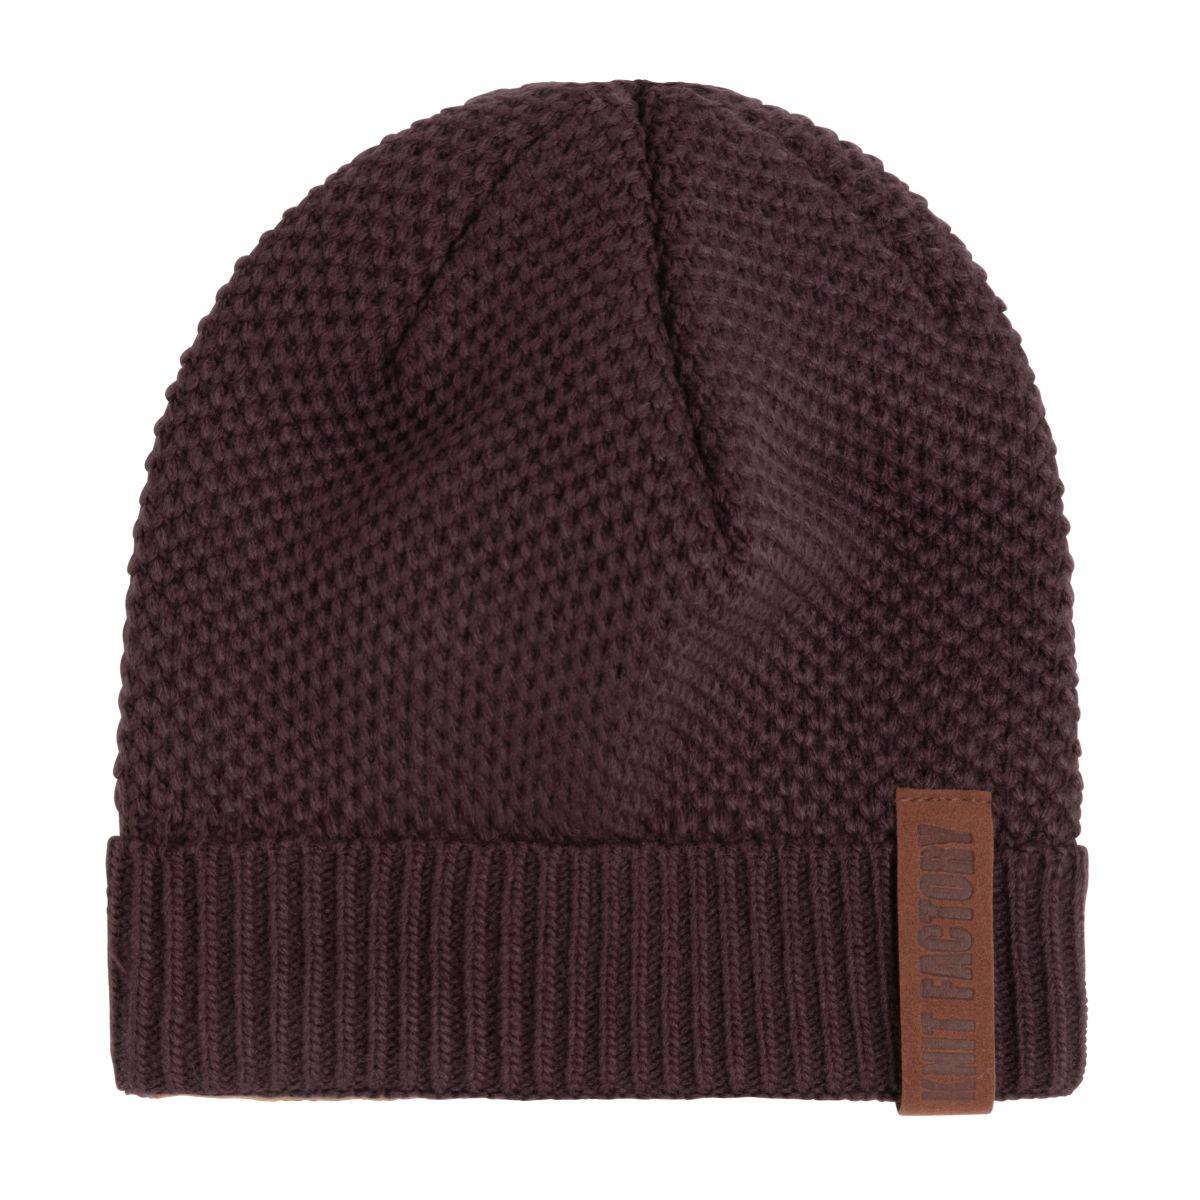 knit factory kf12307002350 jazz muts aubergine 1